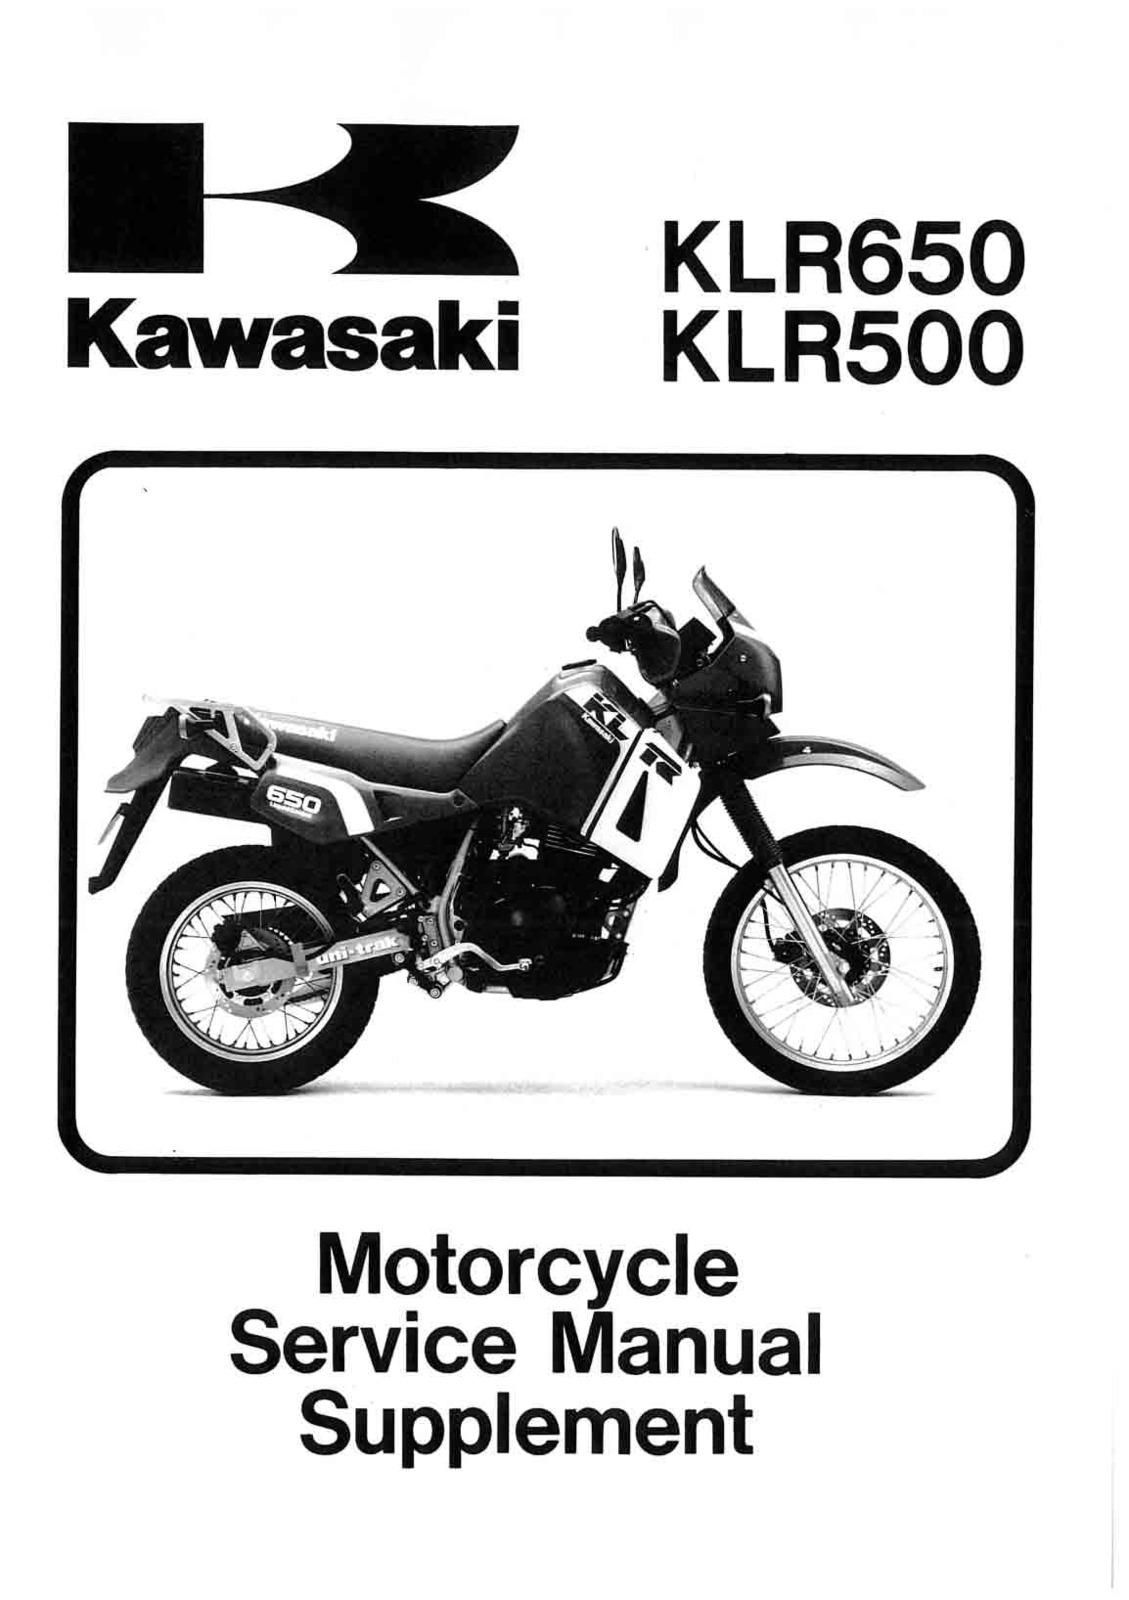 Kawasaki klr500 1987 1988 klr650 1987 2005